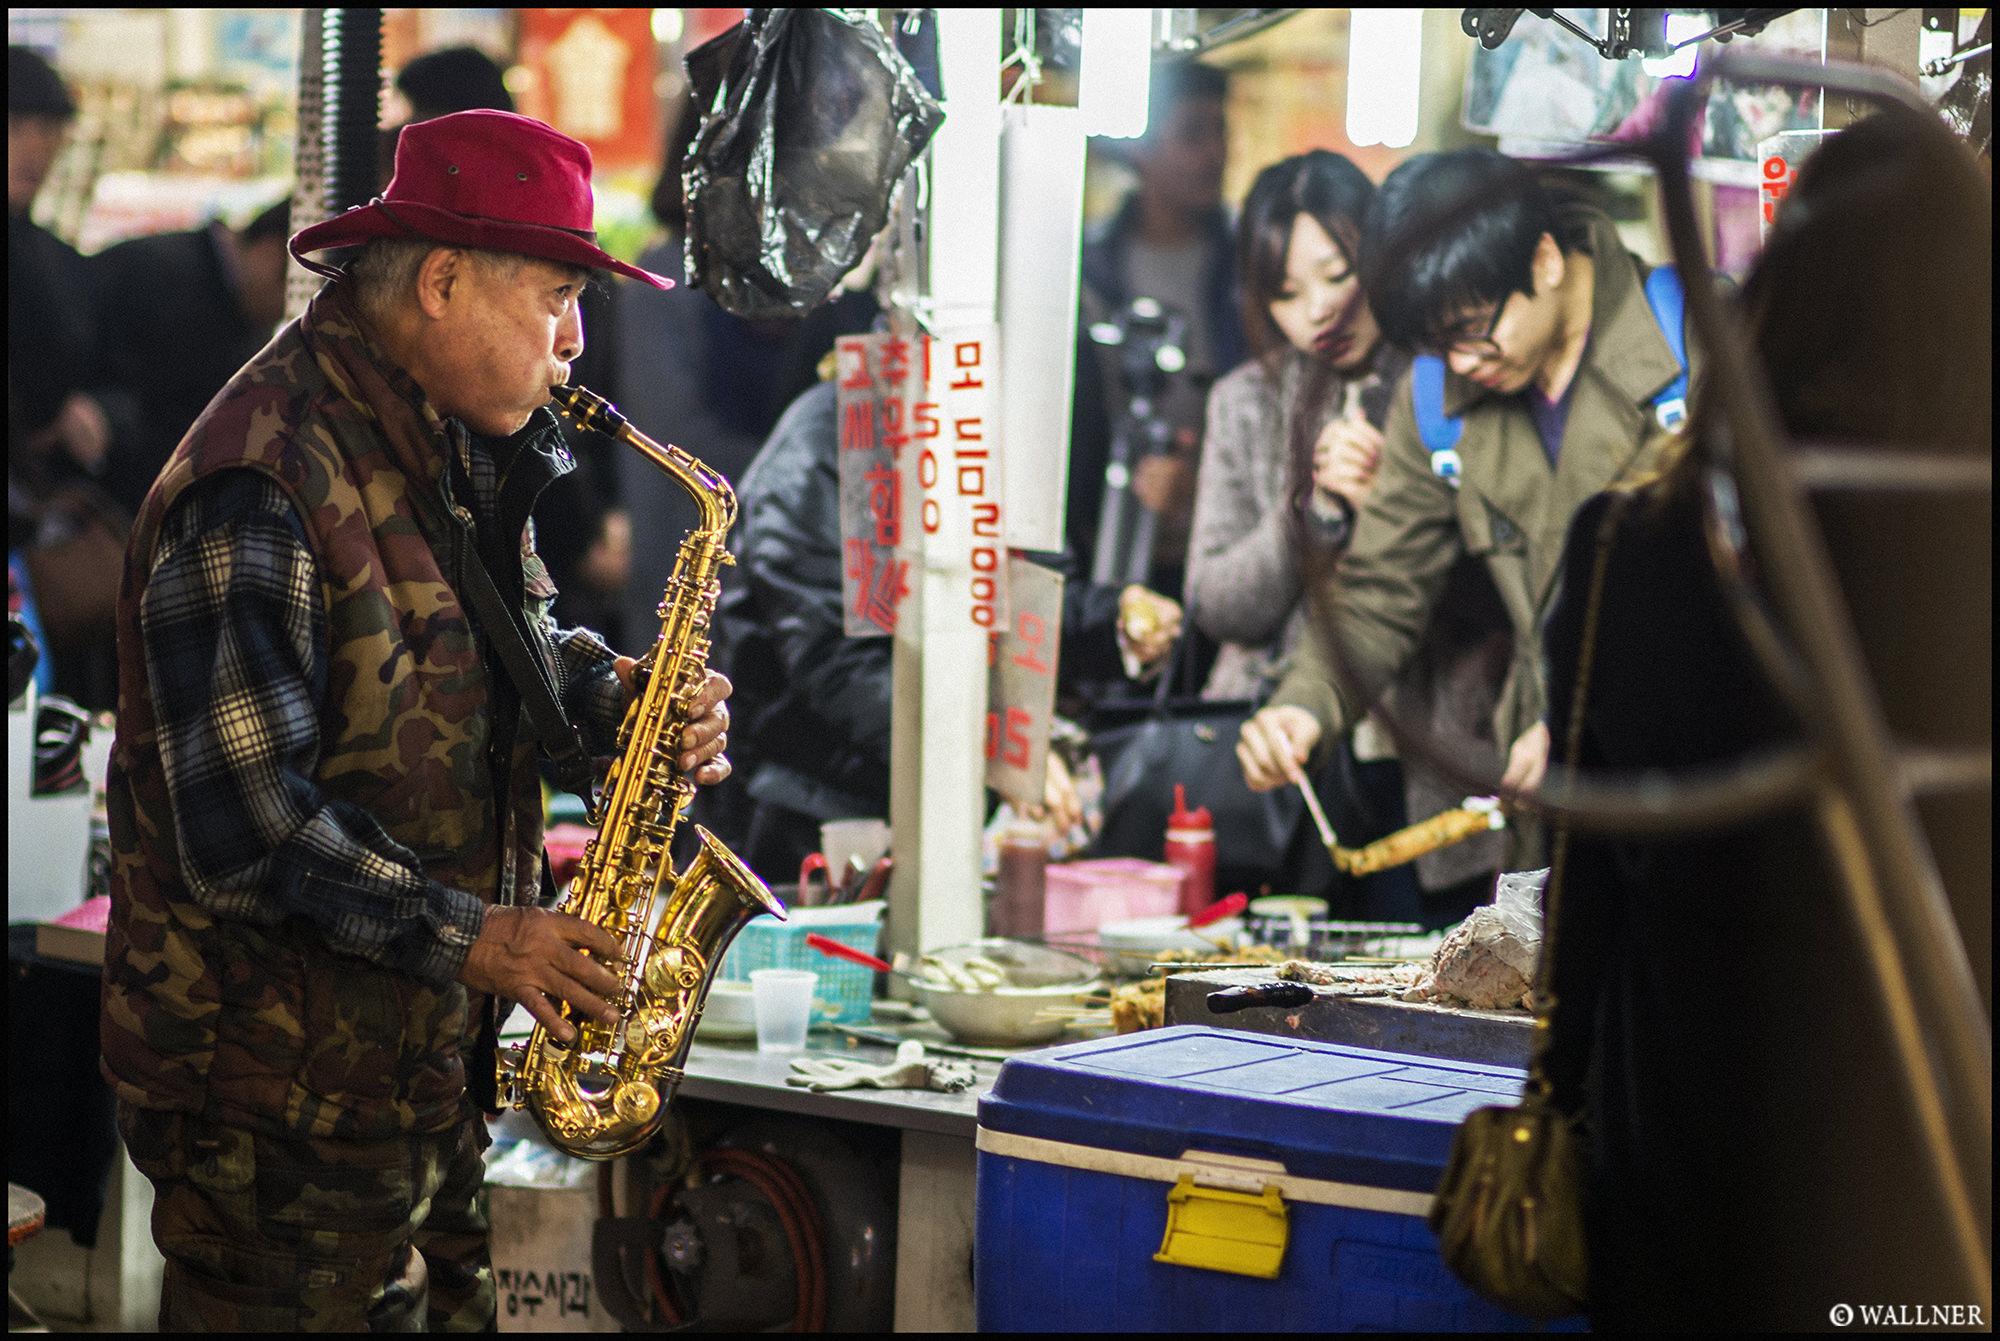 Digital Patrik Wallner Seoul The Saxophone Guy LOWQ 2000P w WM